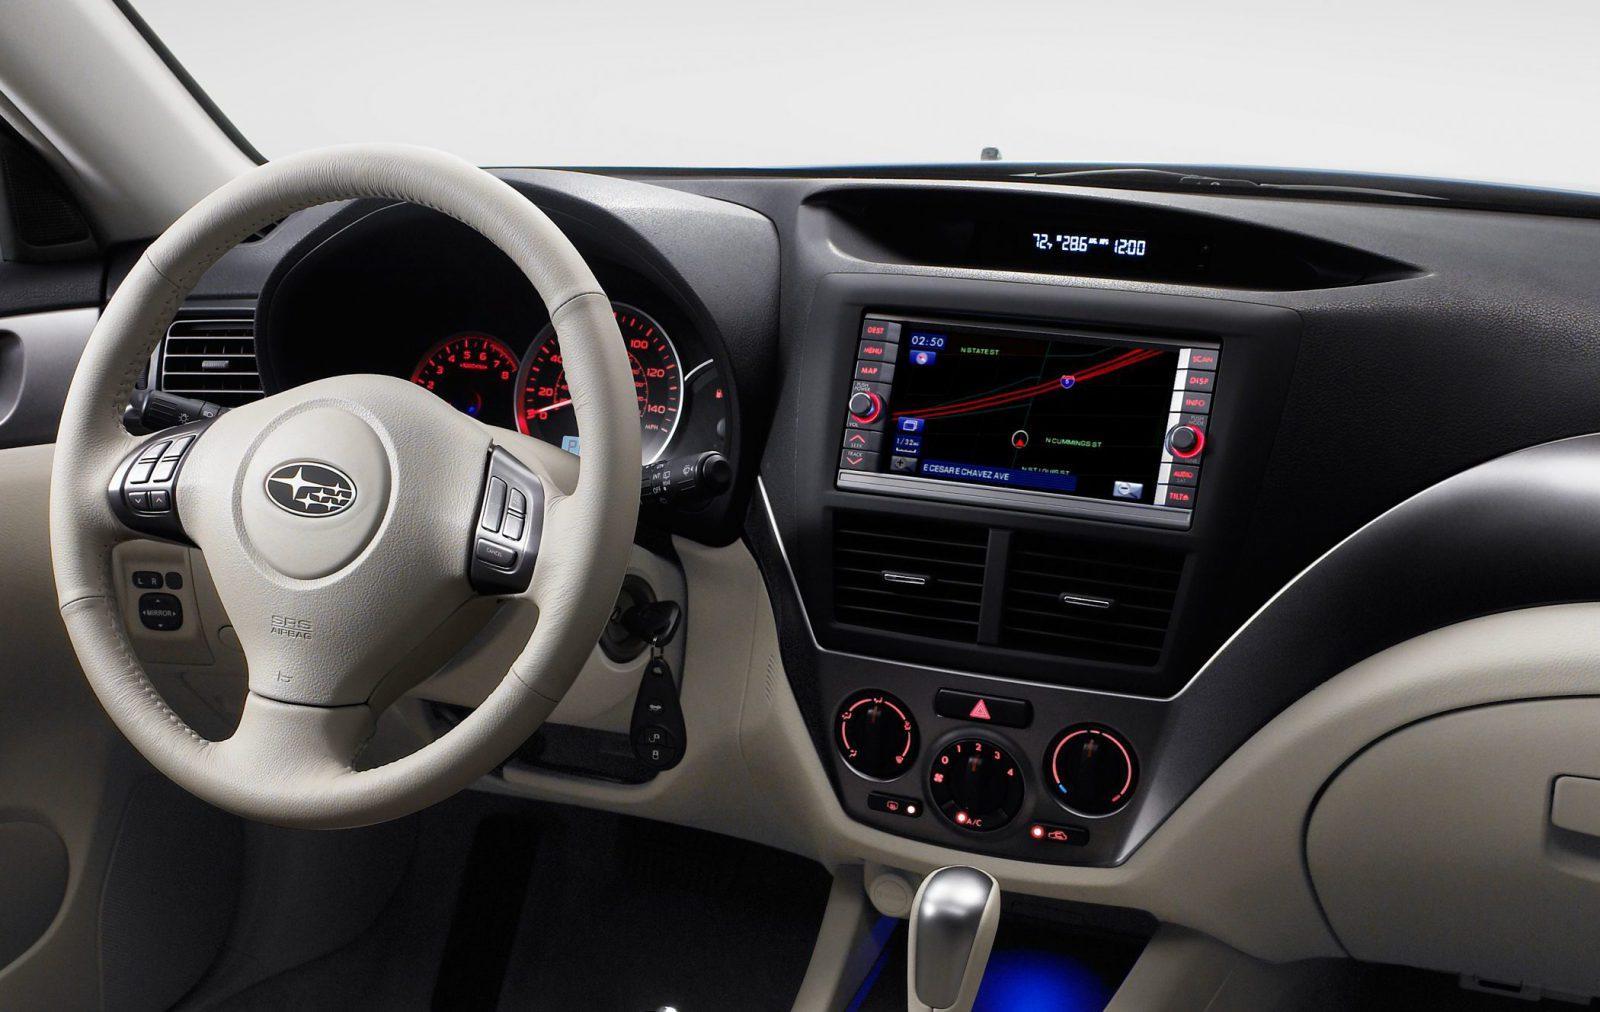 Subaru Impreza 2011 review